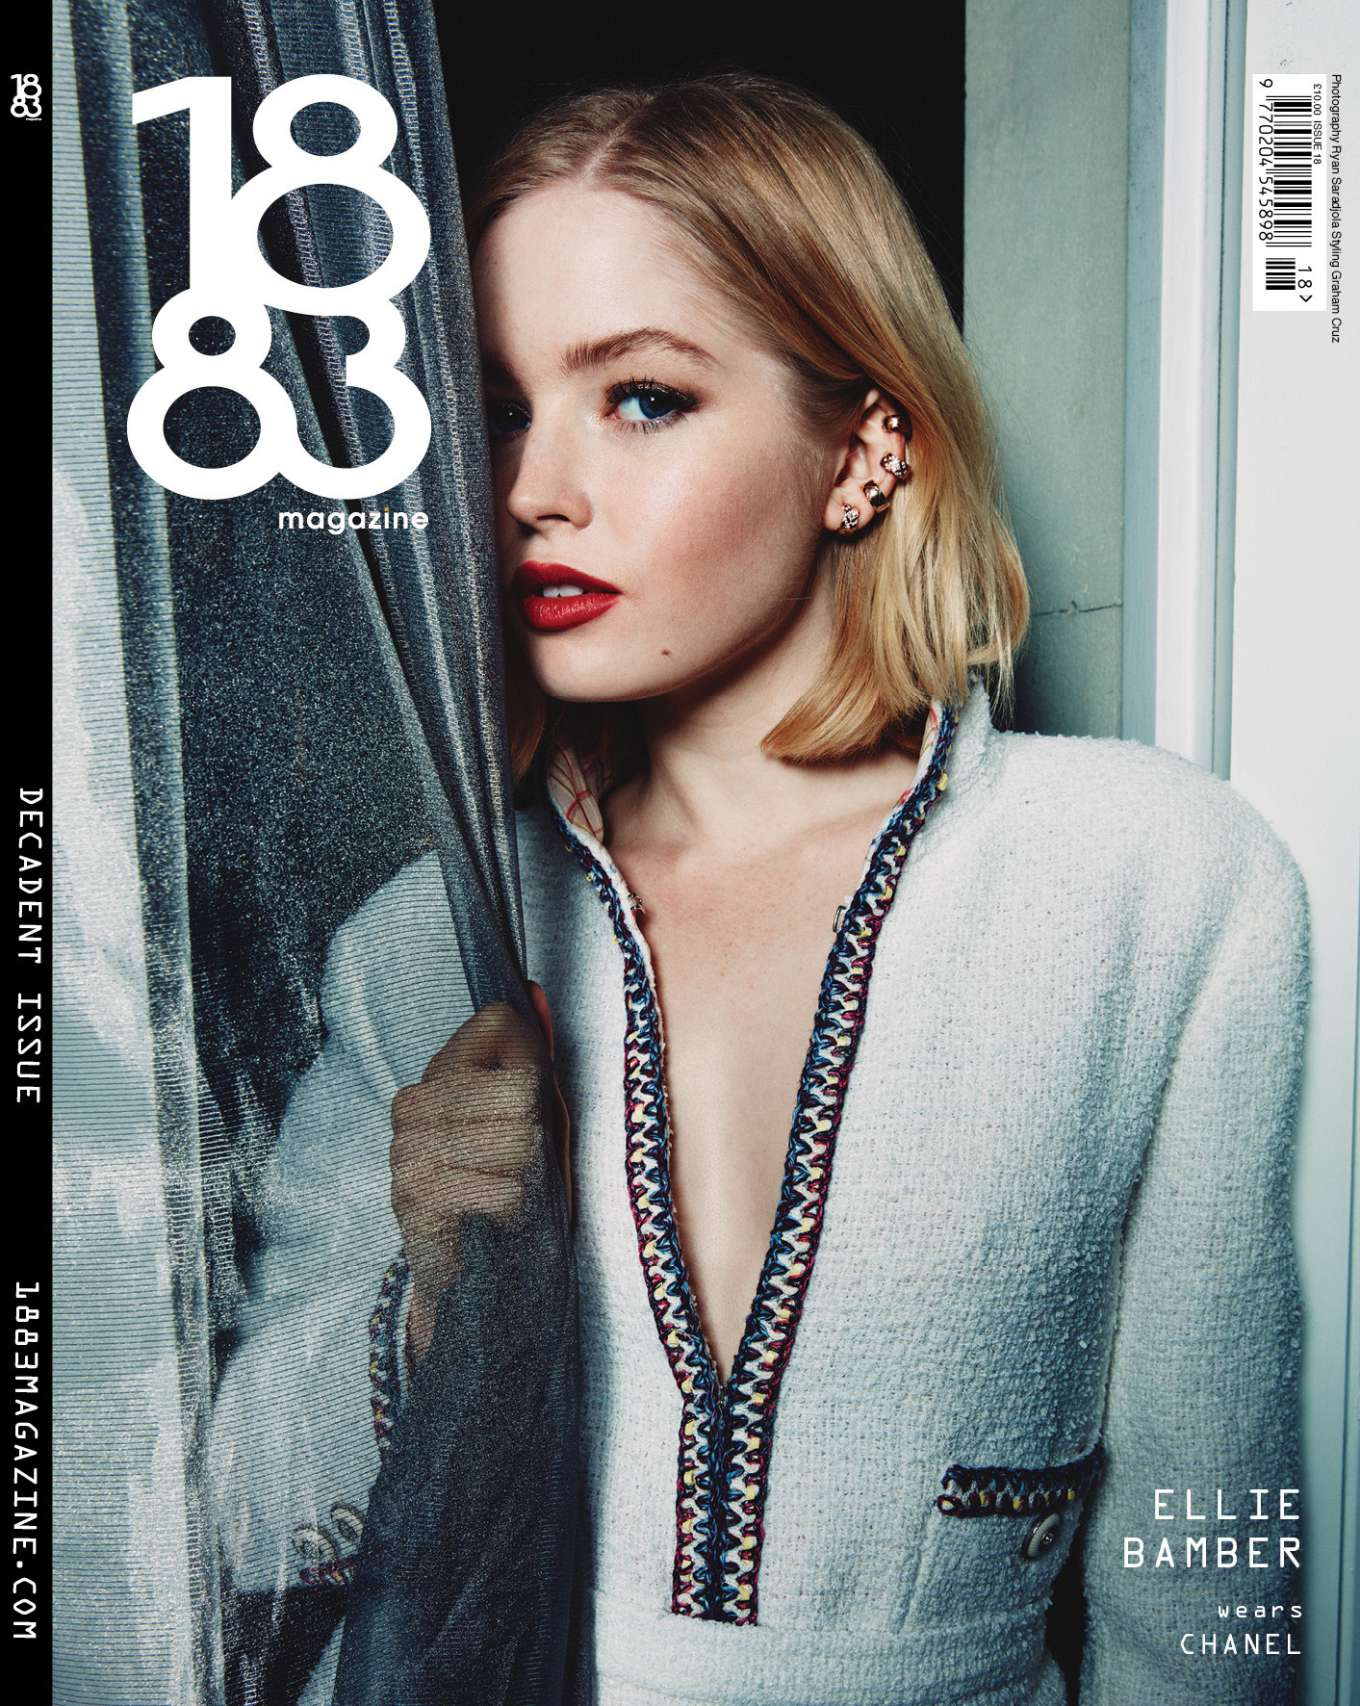 Ellie Bamber - 1883 Magazine Decadent Cover 2020